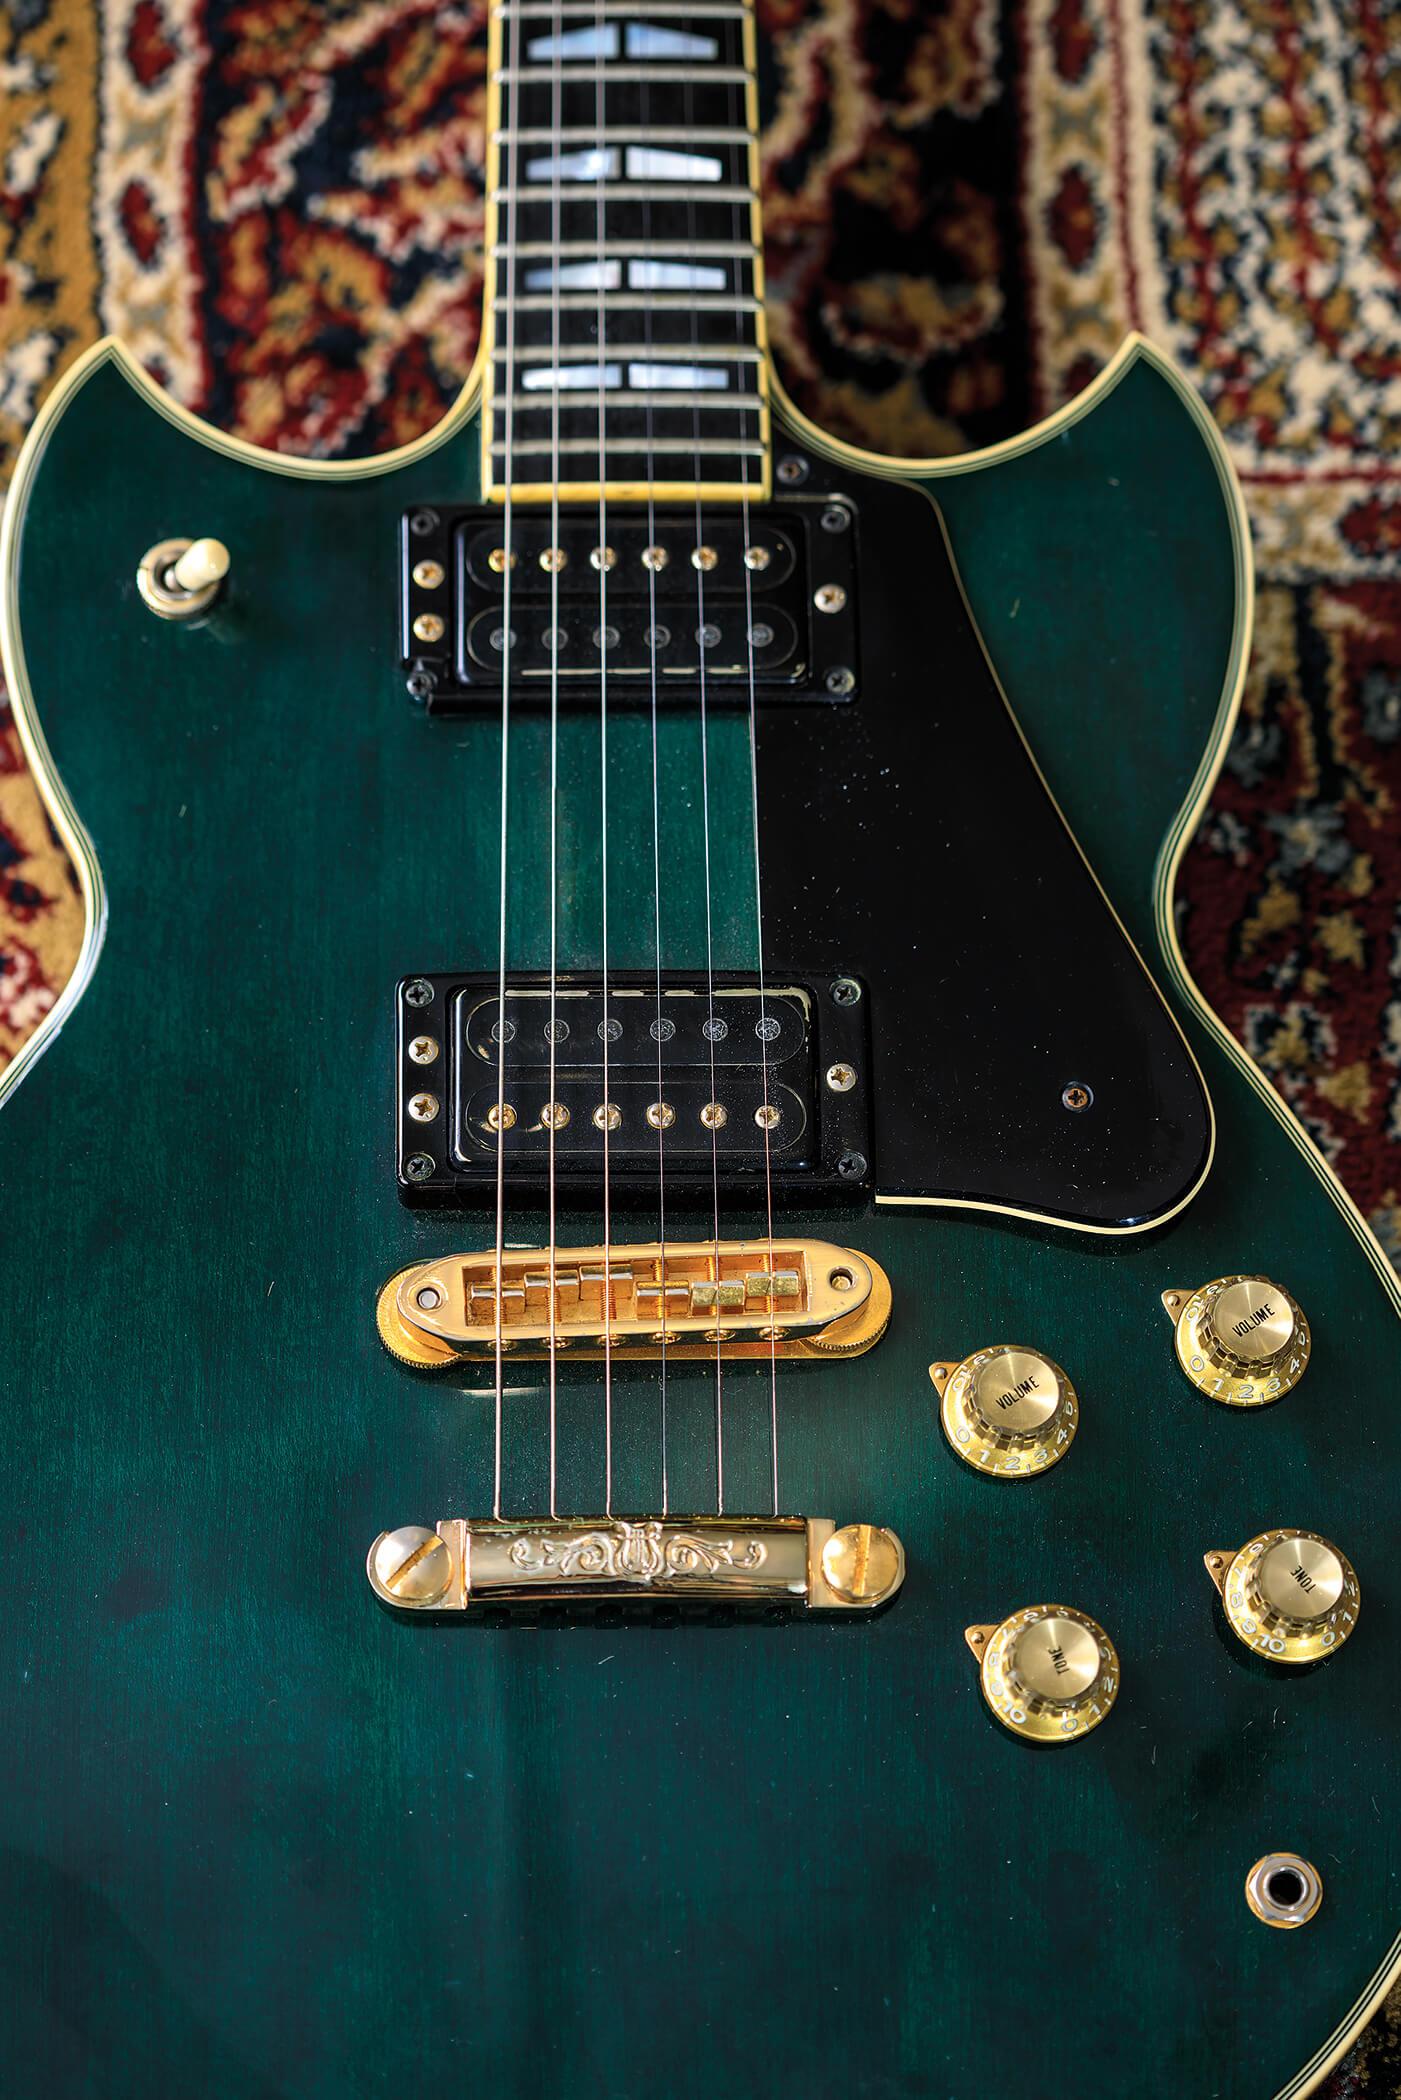 Collections Elite Vintage Guitars 1982 Yahama SG-2000S